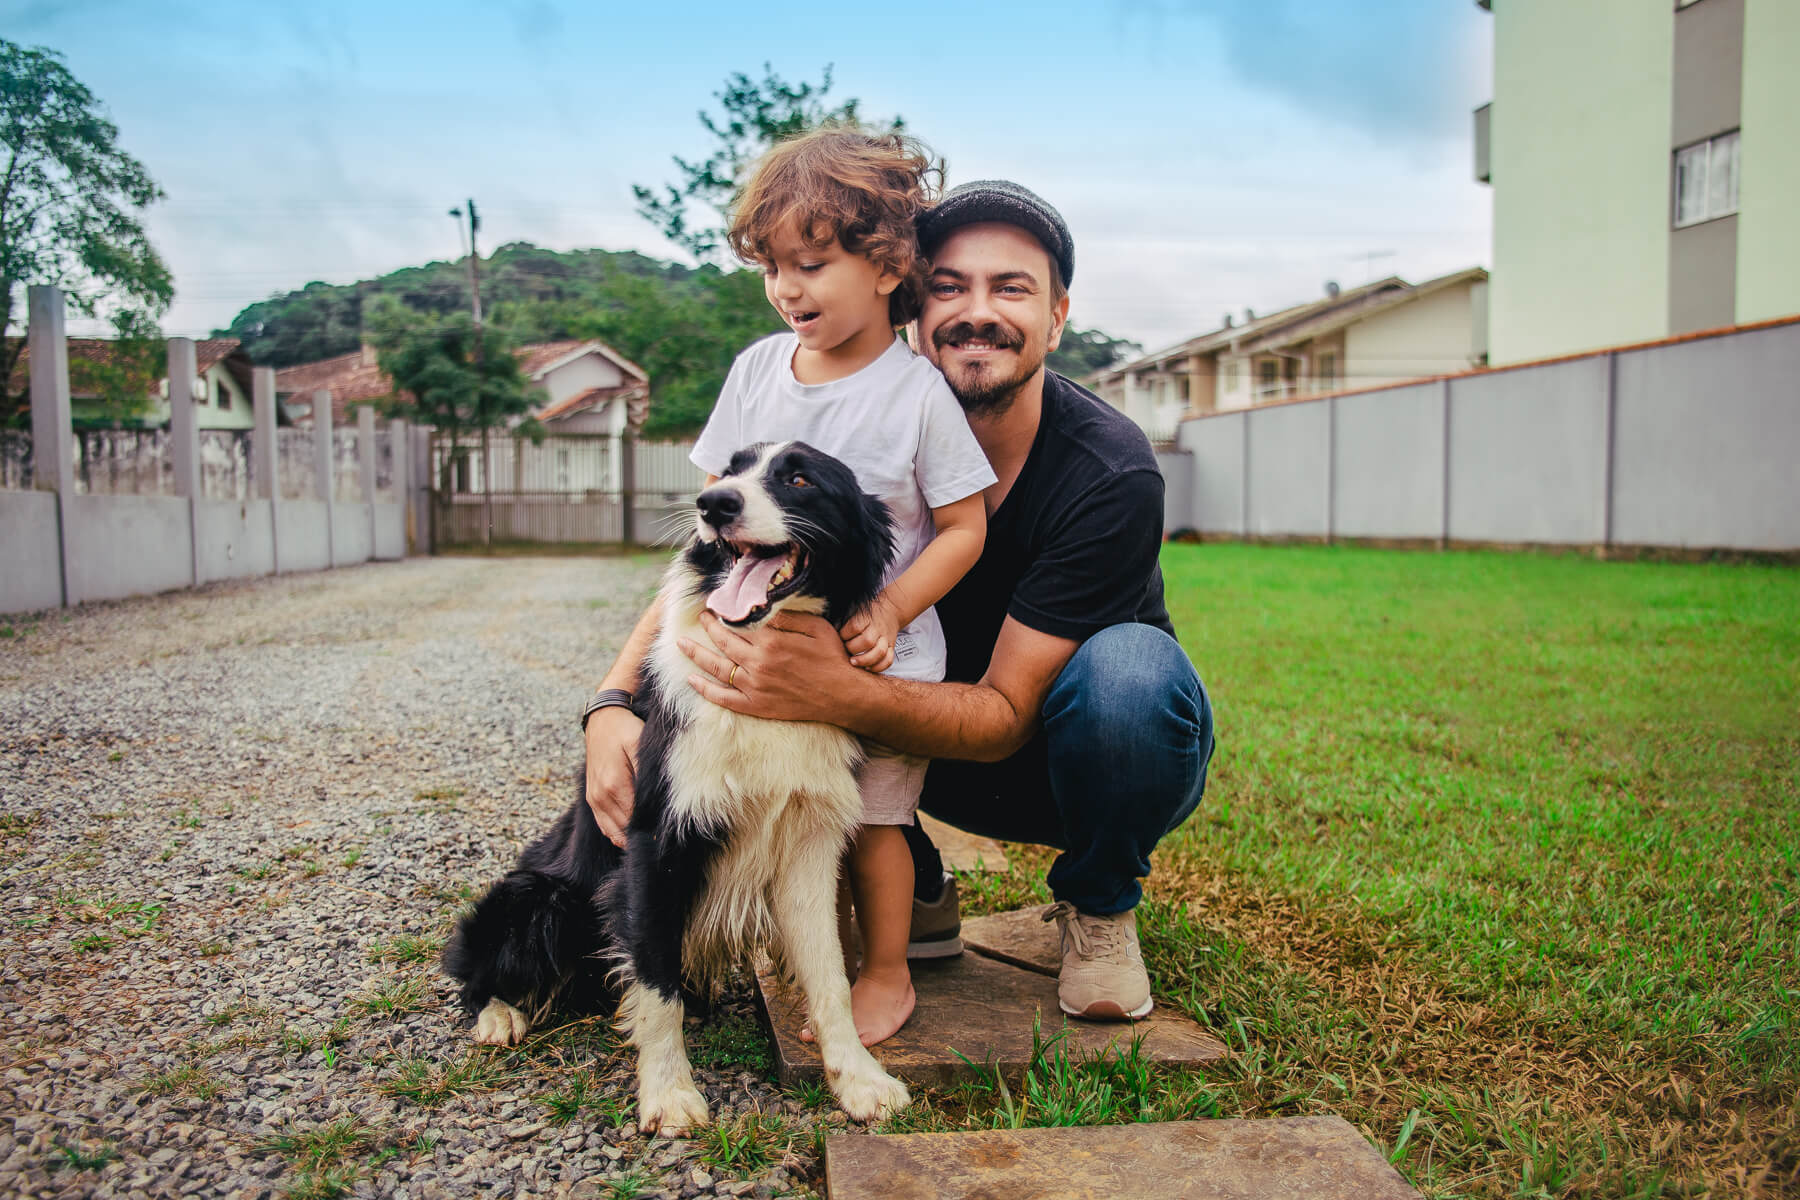 Ensaio Gestante em Familia Joinville